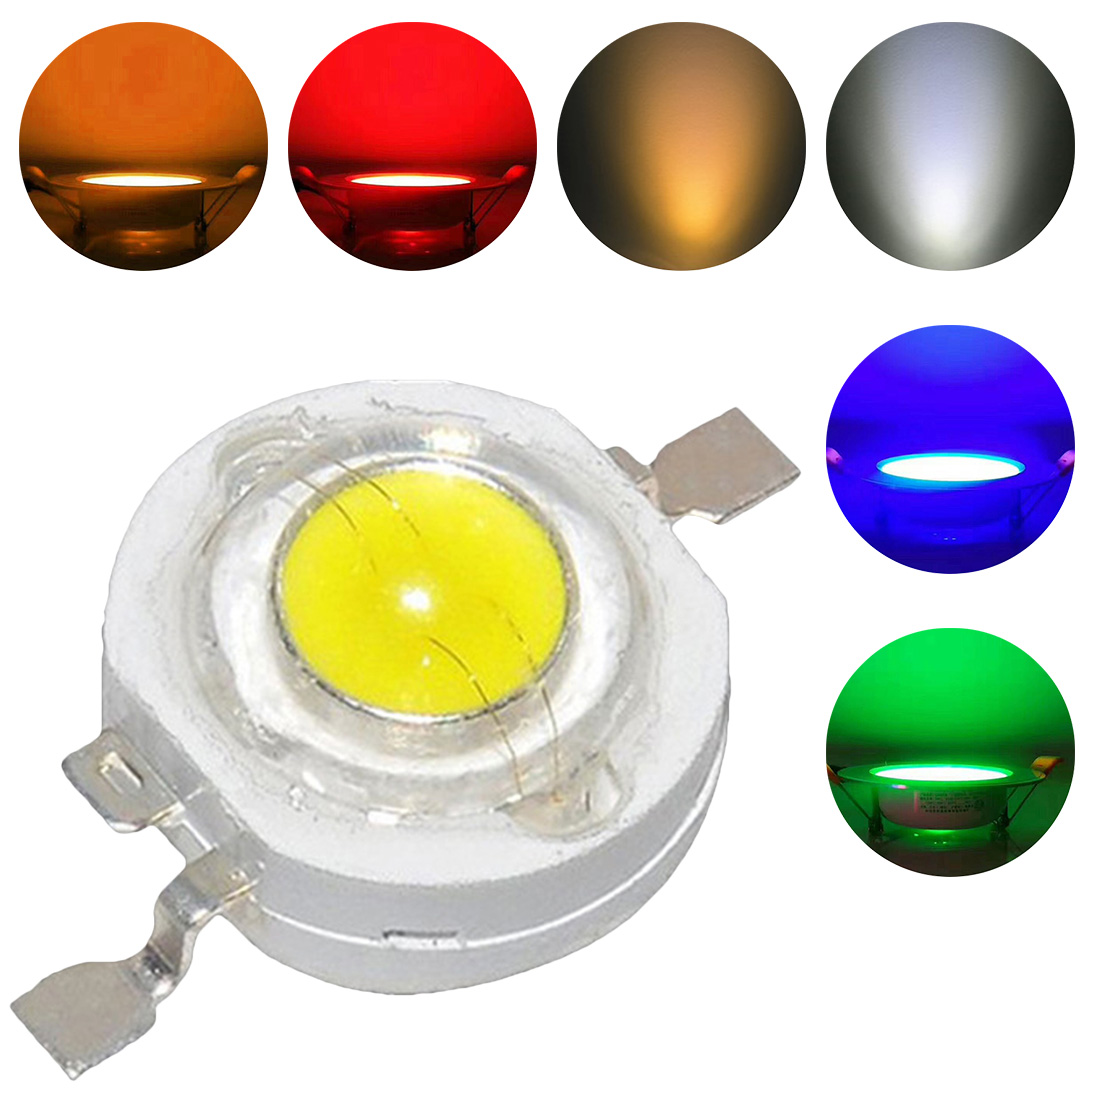 1pcs 10 And 1 White/warm White 1w 3 W High Power LED Lamp Bead White/warm White Light